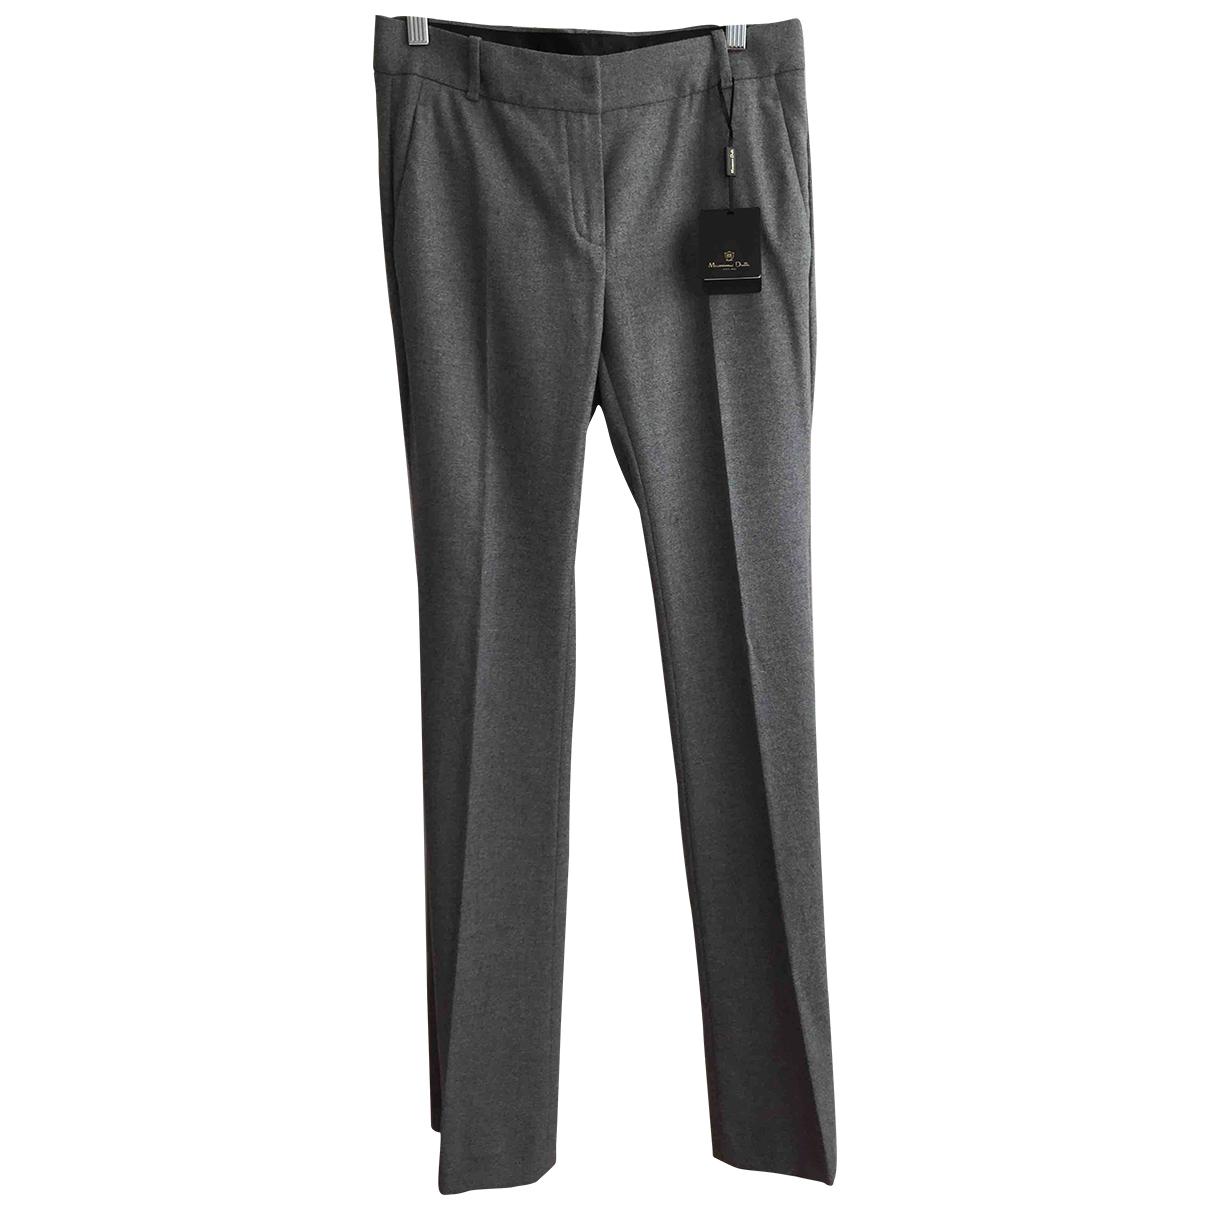 Massimo Dutti \N Grey Trousers for Women S International